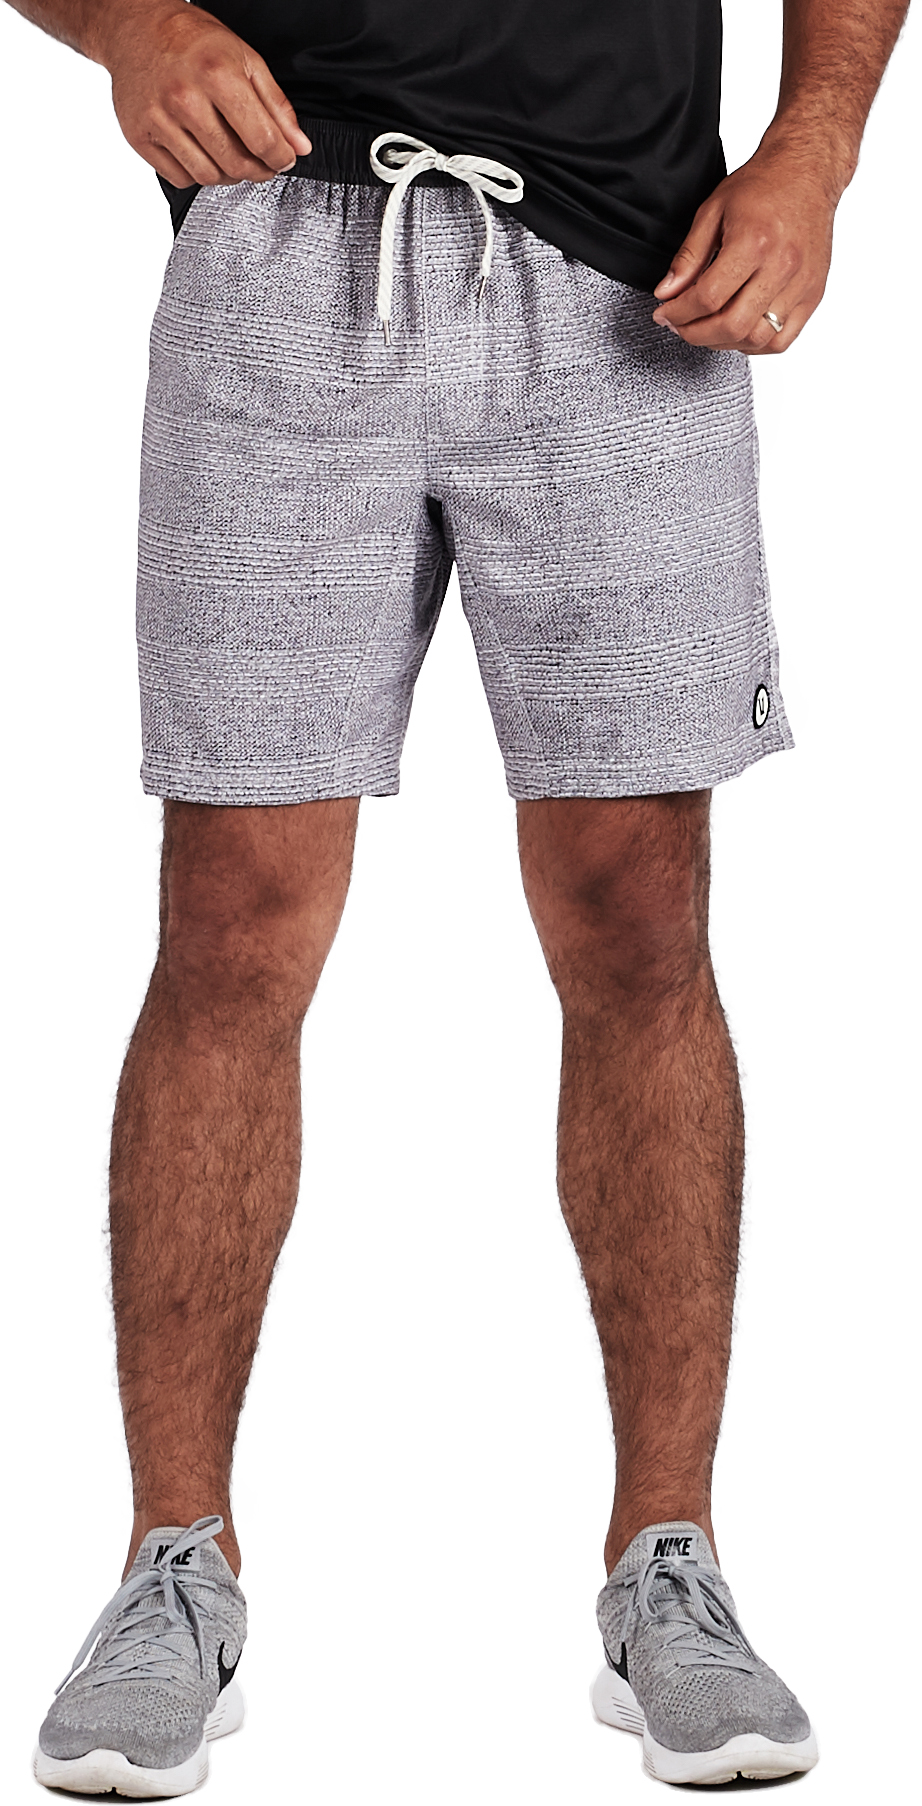 62f3fe41d9 Vuori Kore Shorts - Men's | MEC